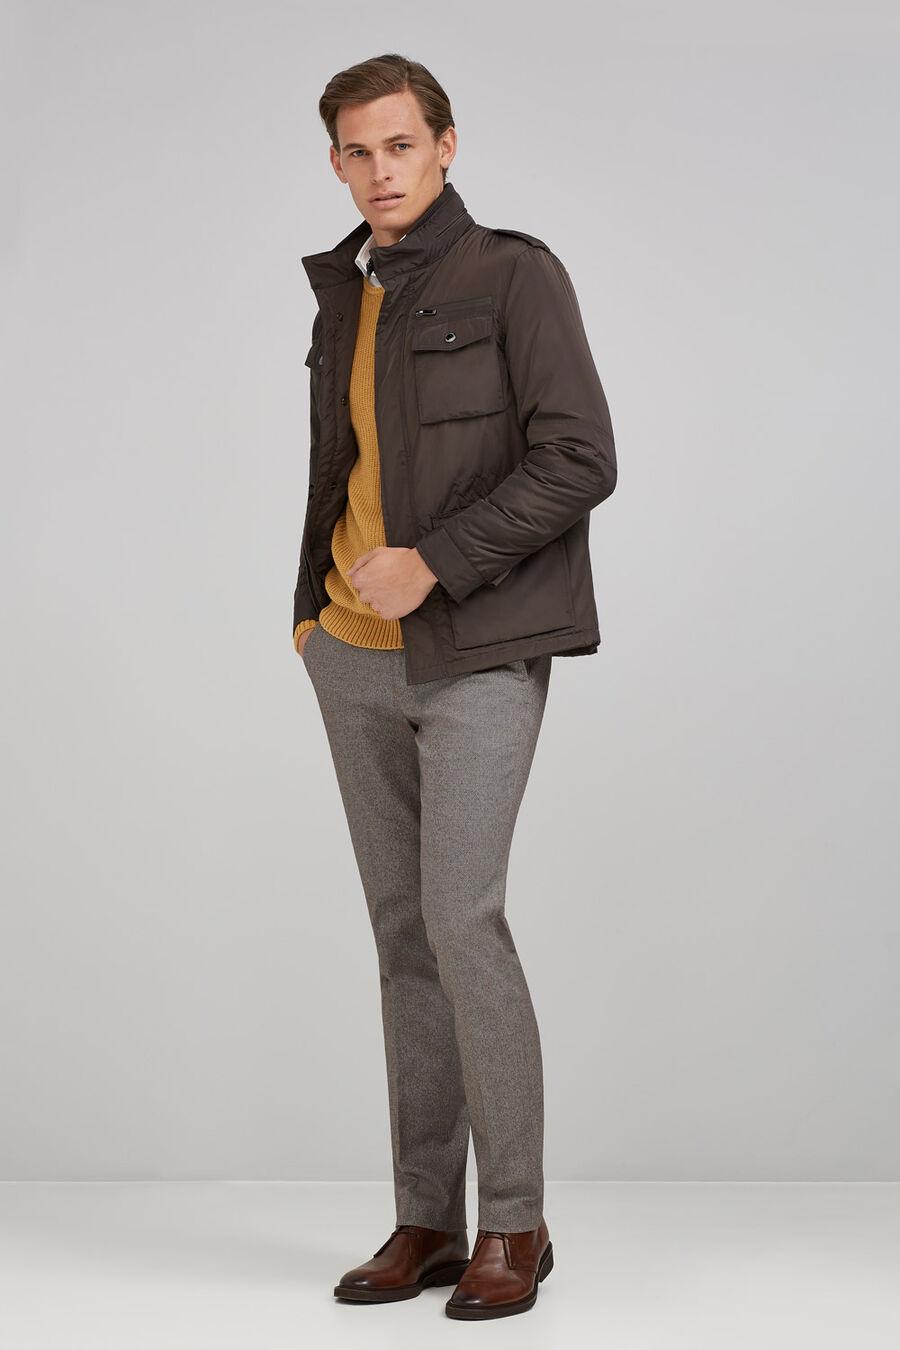 4-pocket jacket